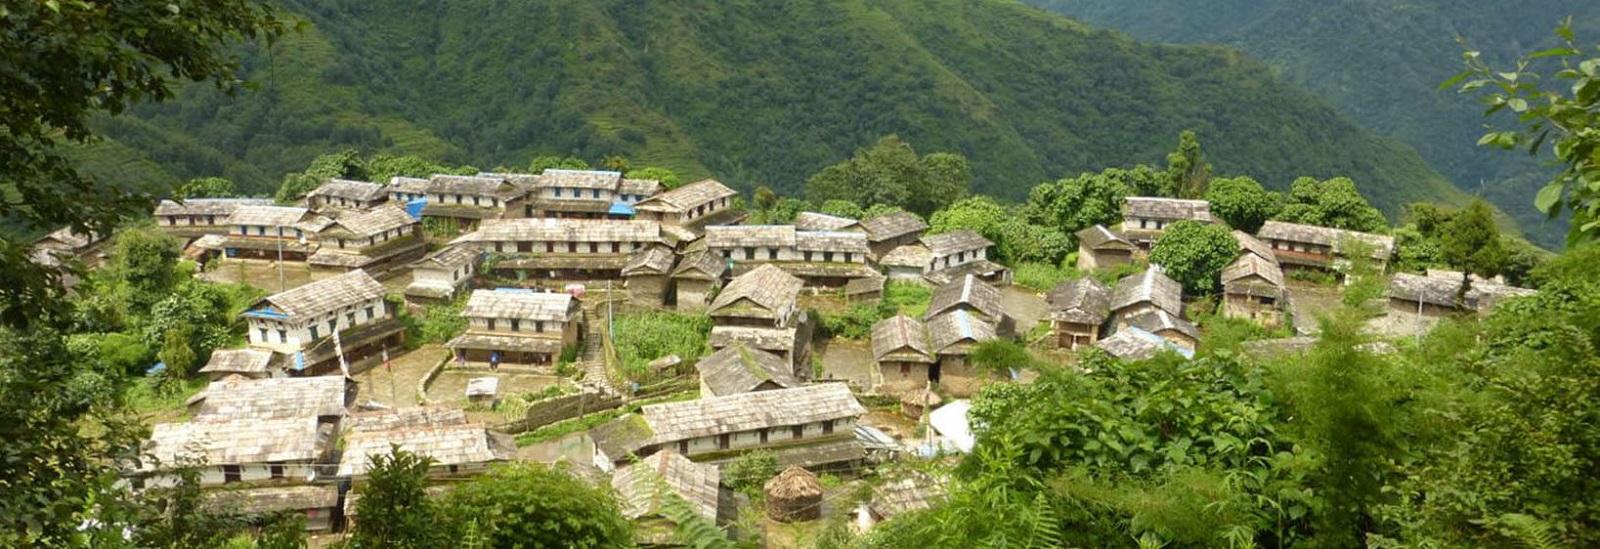 Annapurna Ghale Gaun trekking